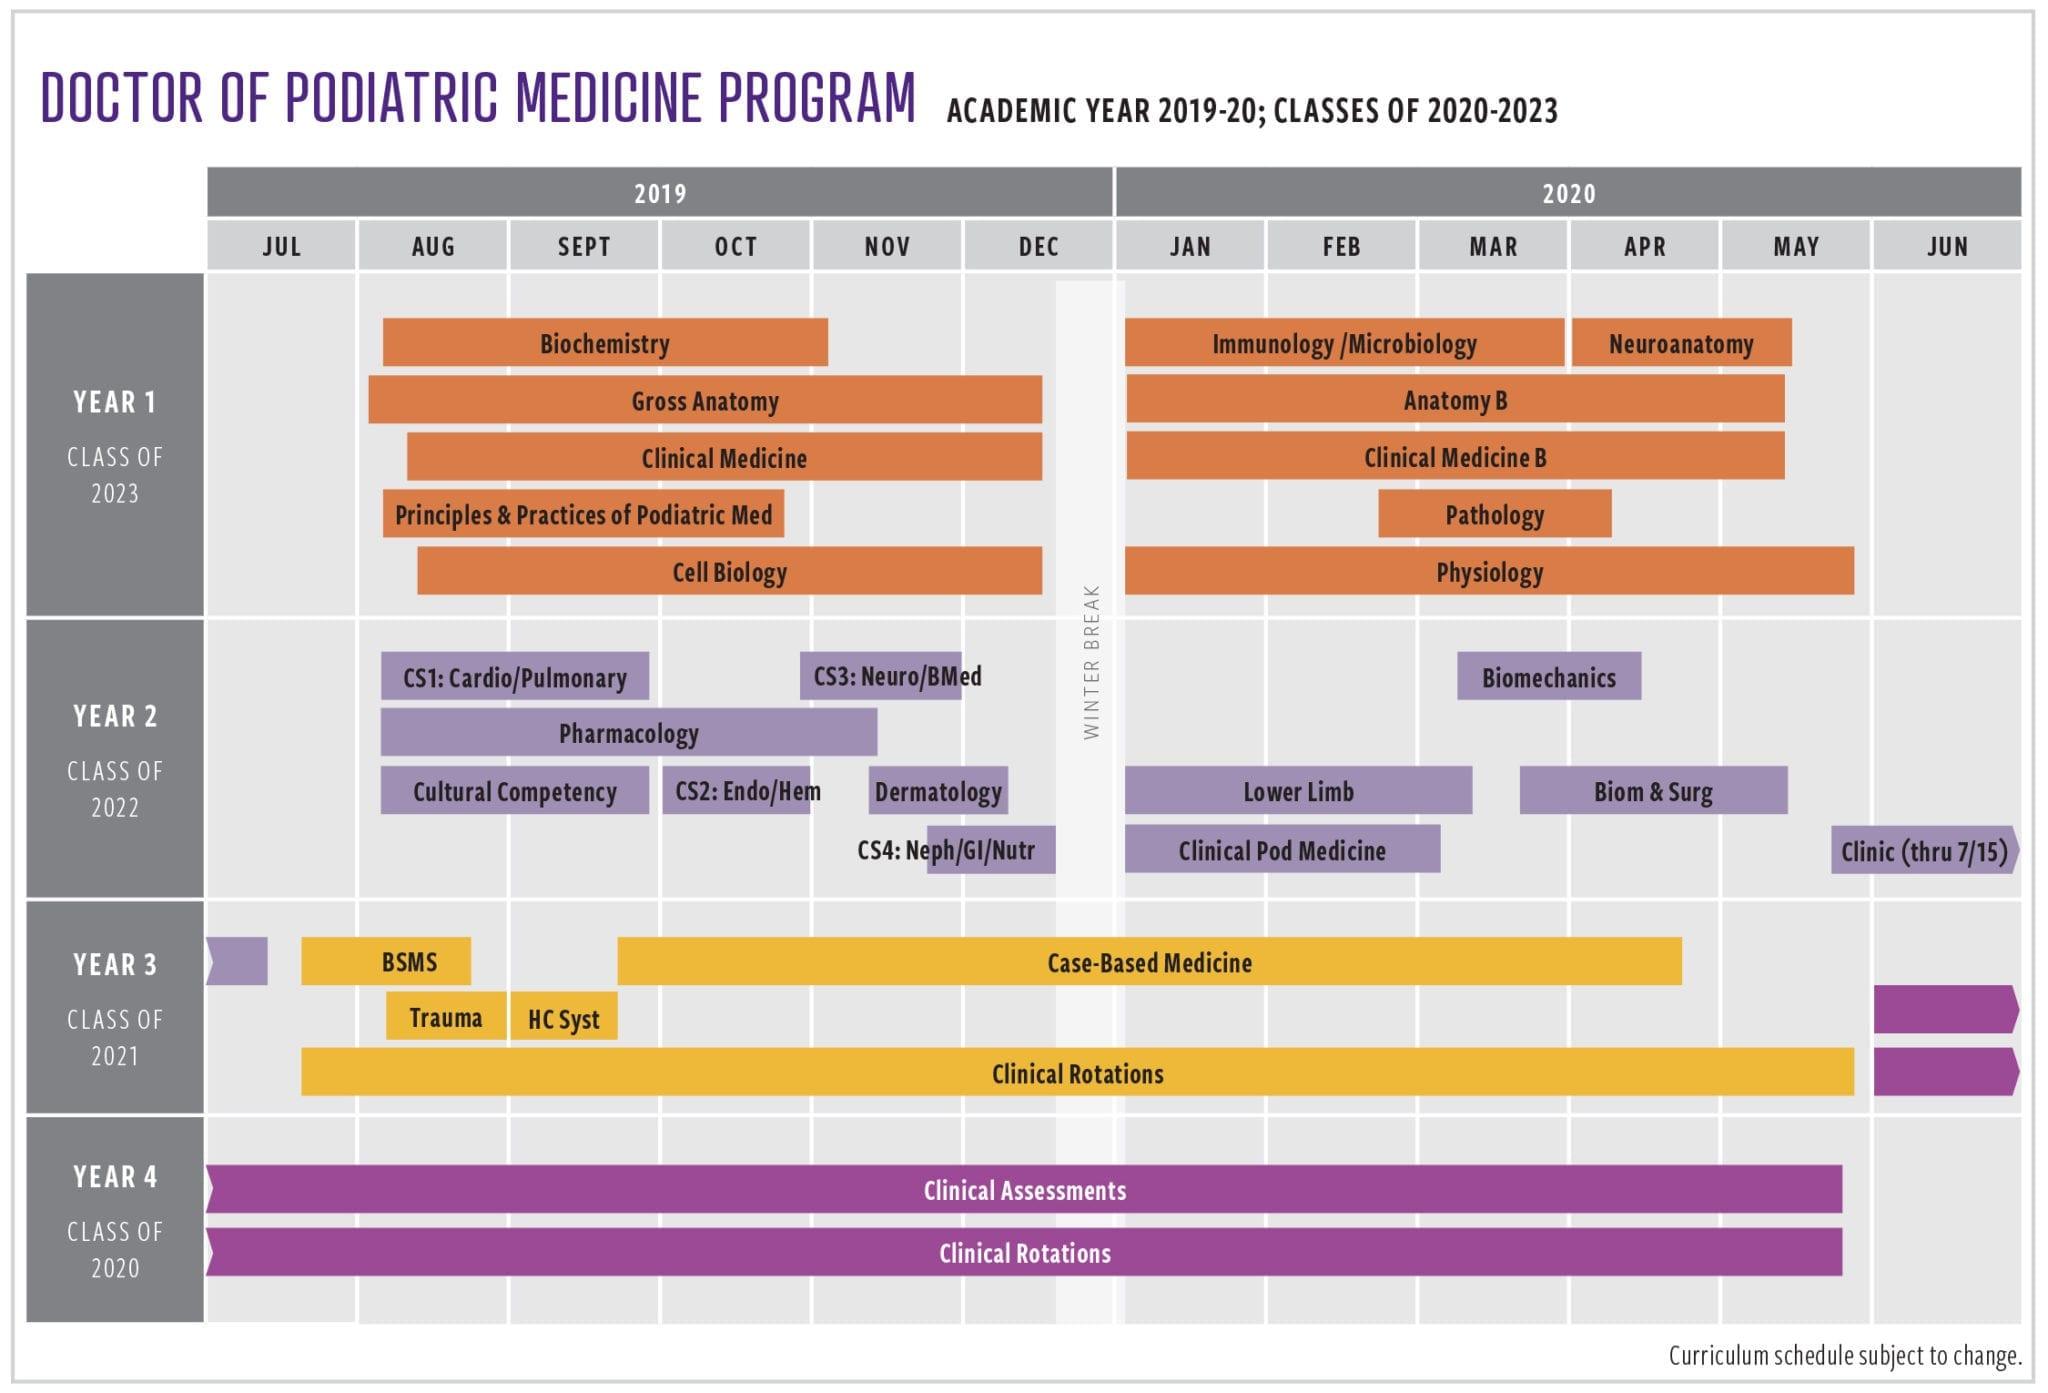 Des Moines University Doctor of Podiatric Medicine 2019-20 Curriculum